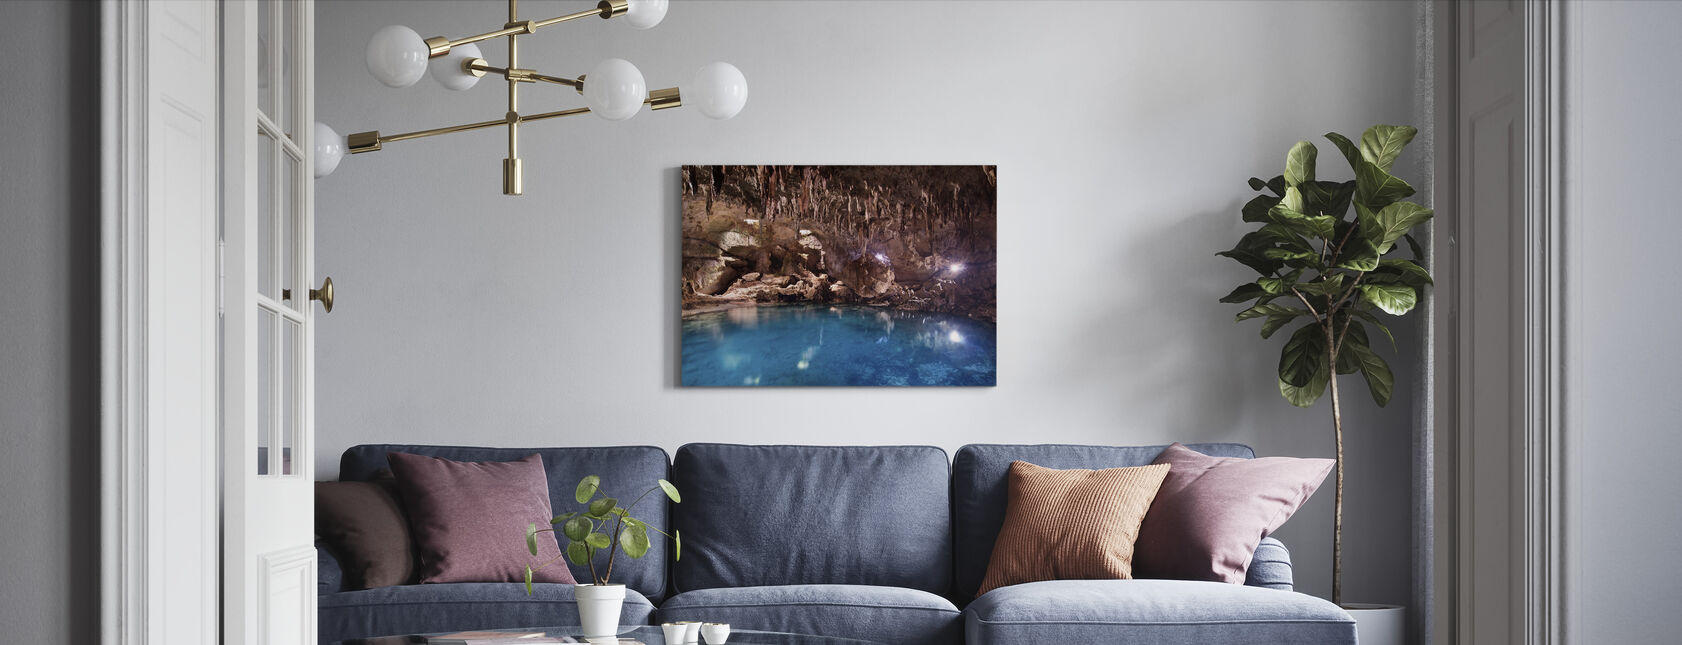 Hinagdanan Cave Pool - Canvastavla - Vardagsrum